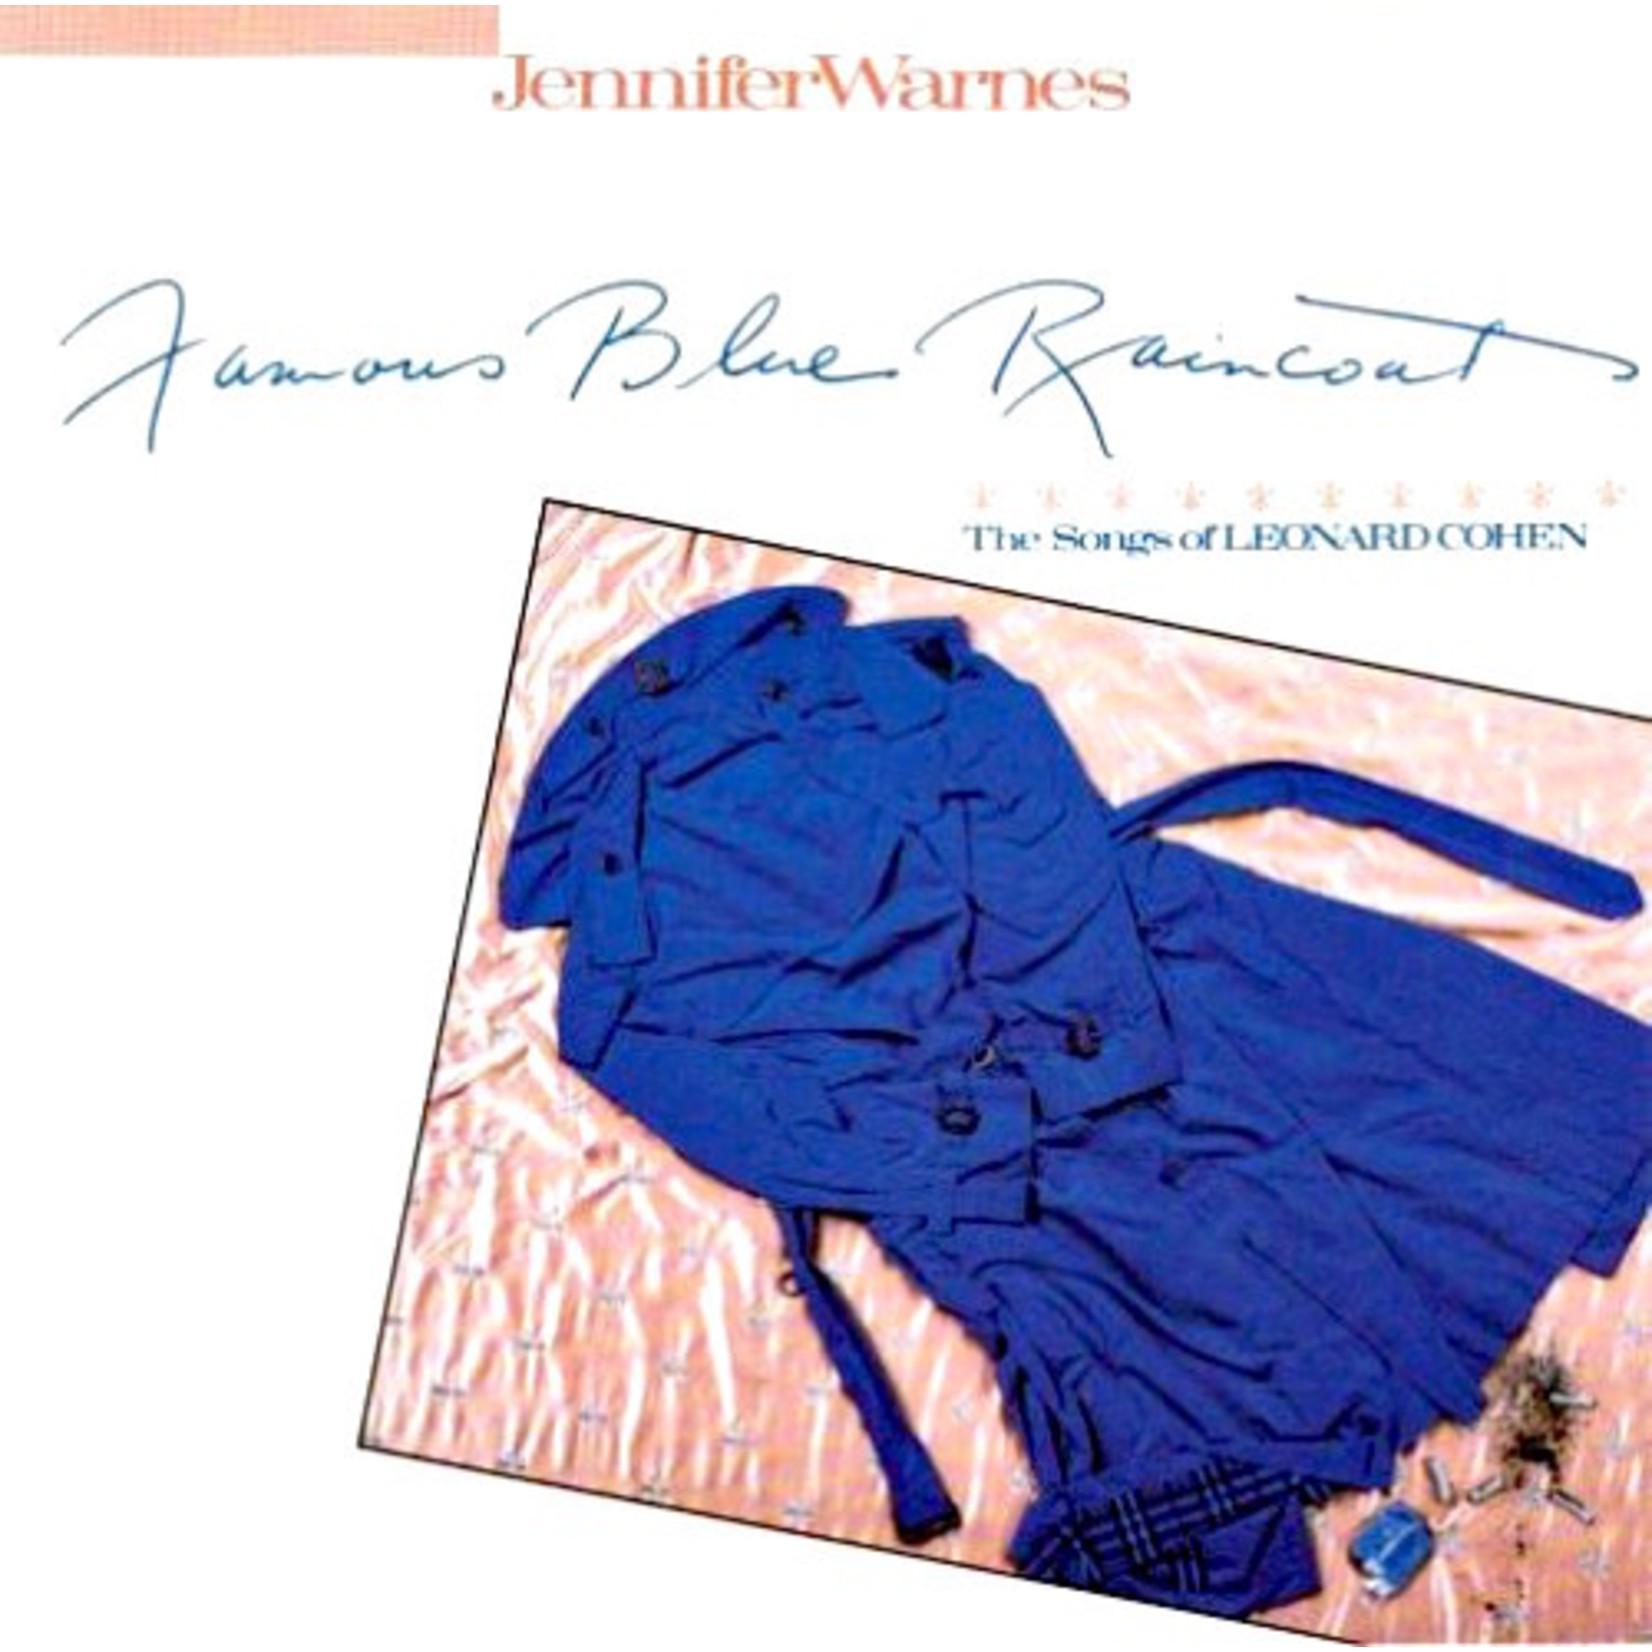 [Vintage] Warnes, Jennifer (Leonard Cohen): Famous Blue Raincoat